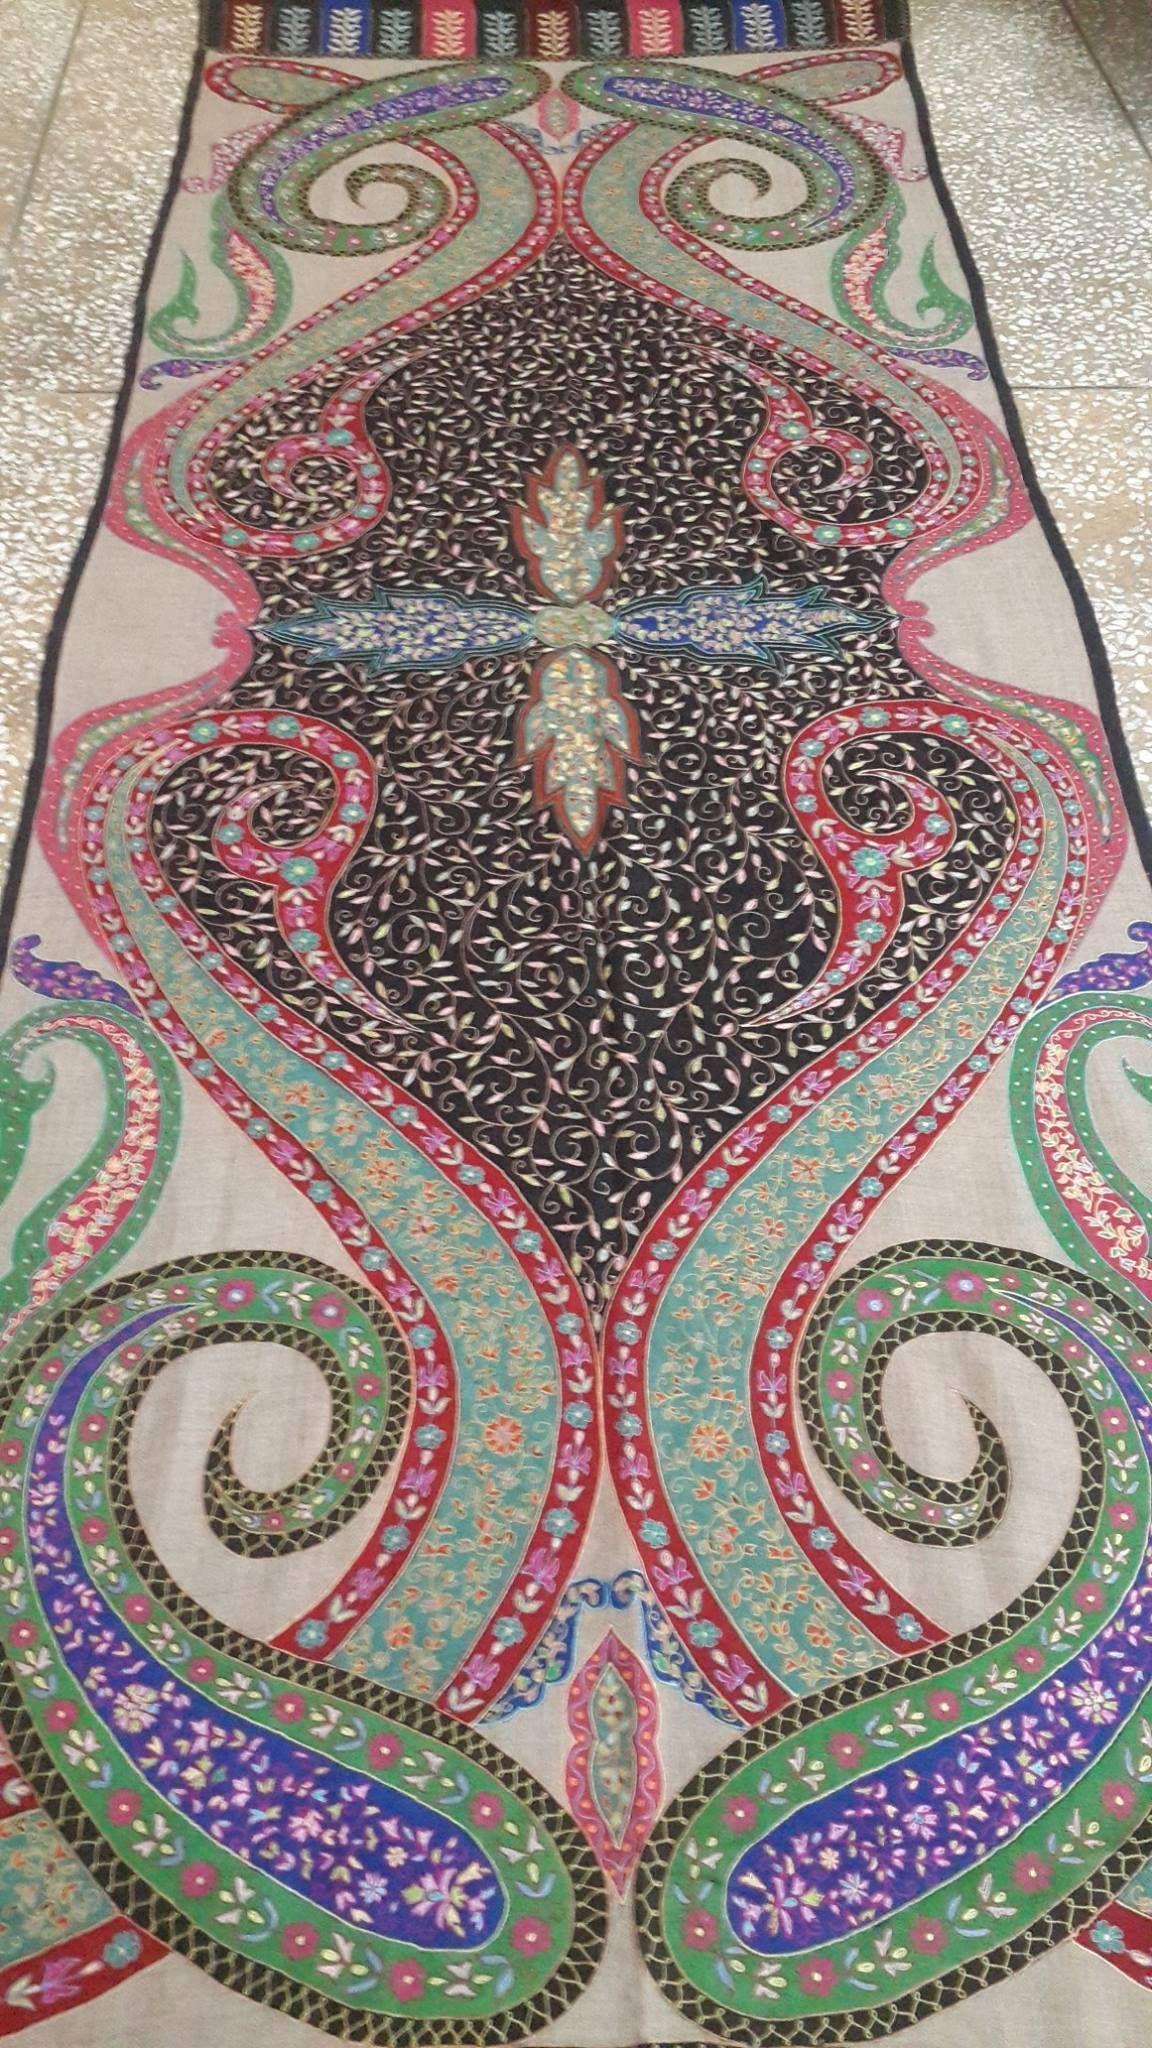 South Asian Textiles